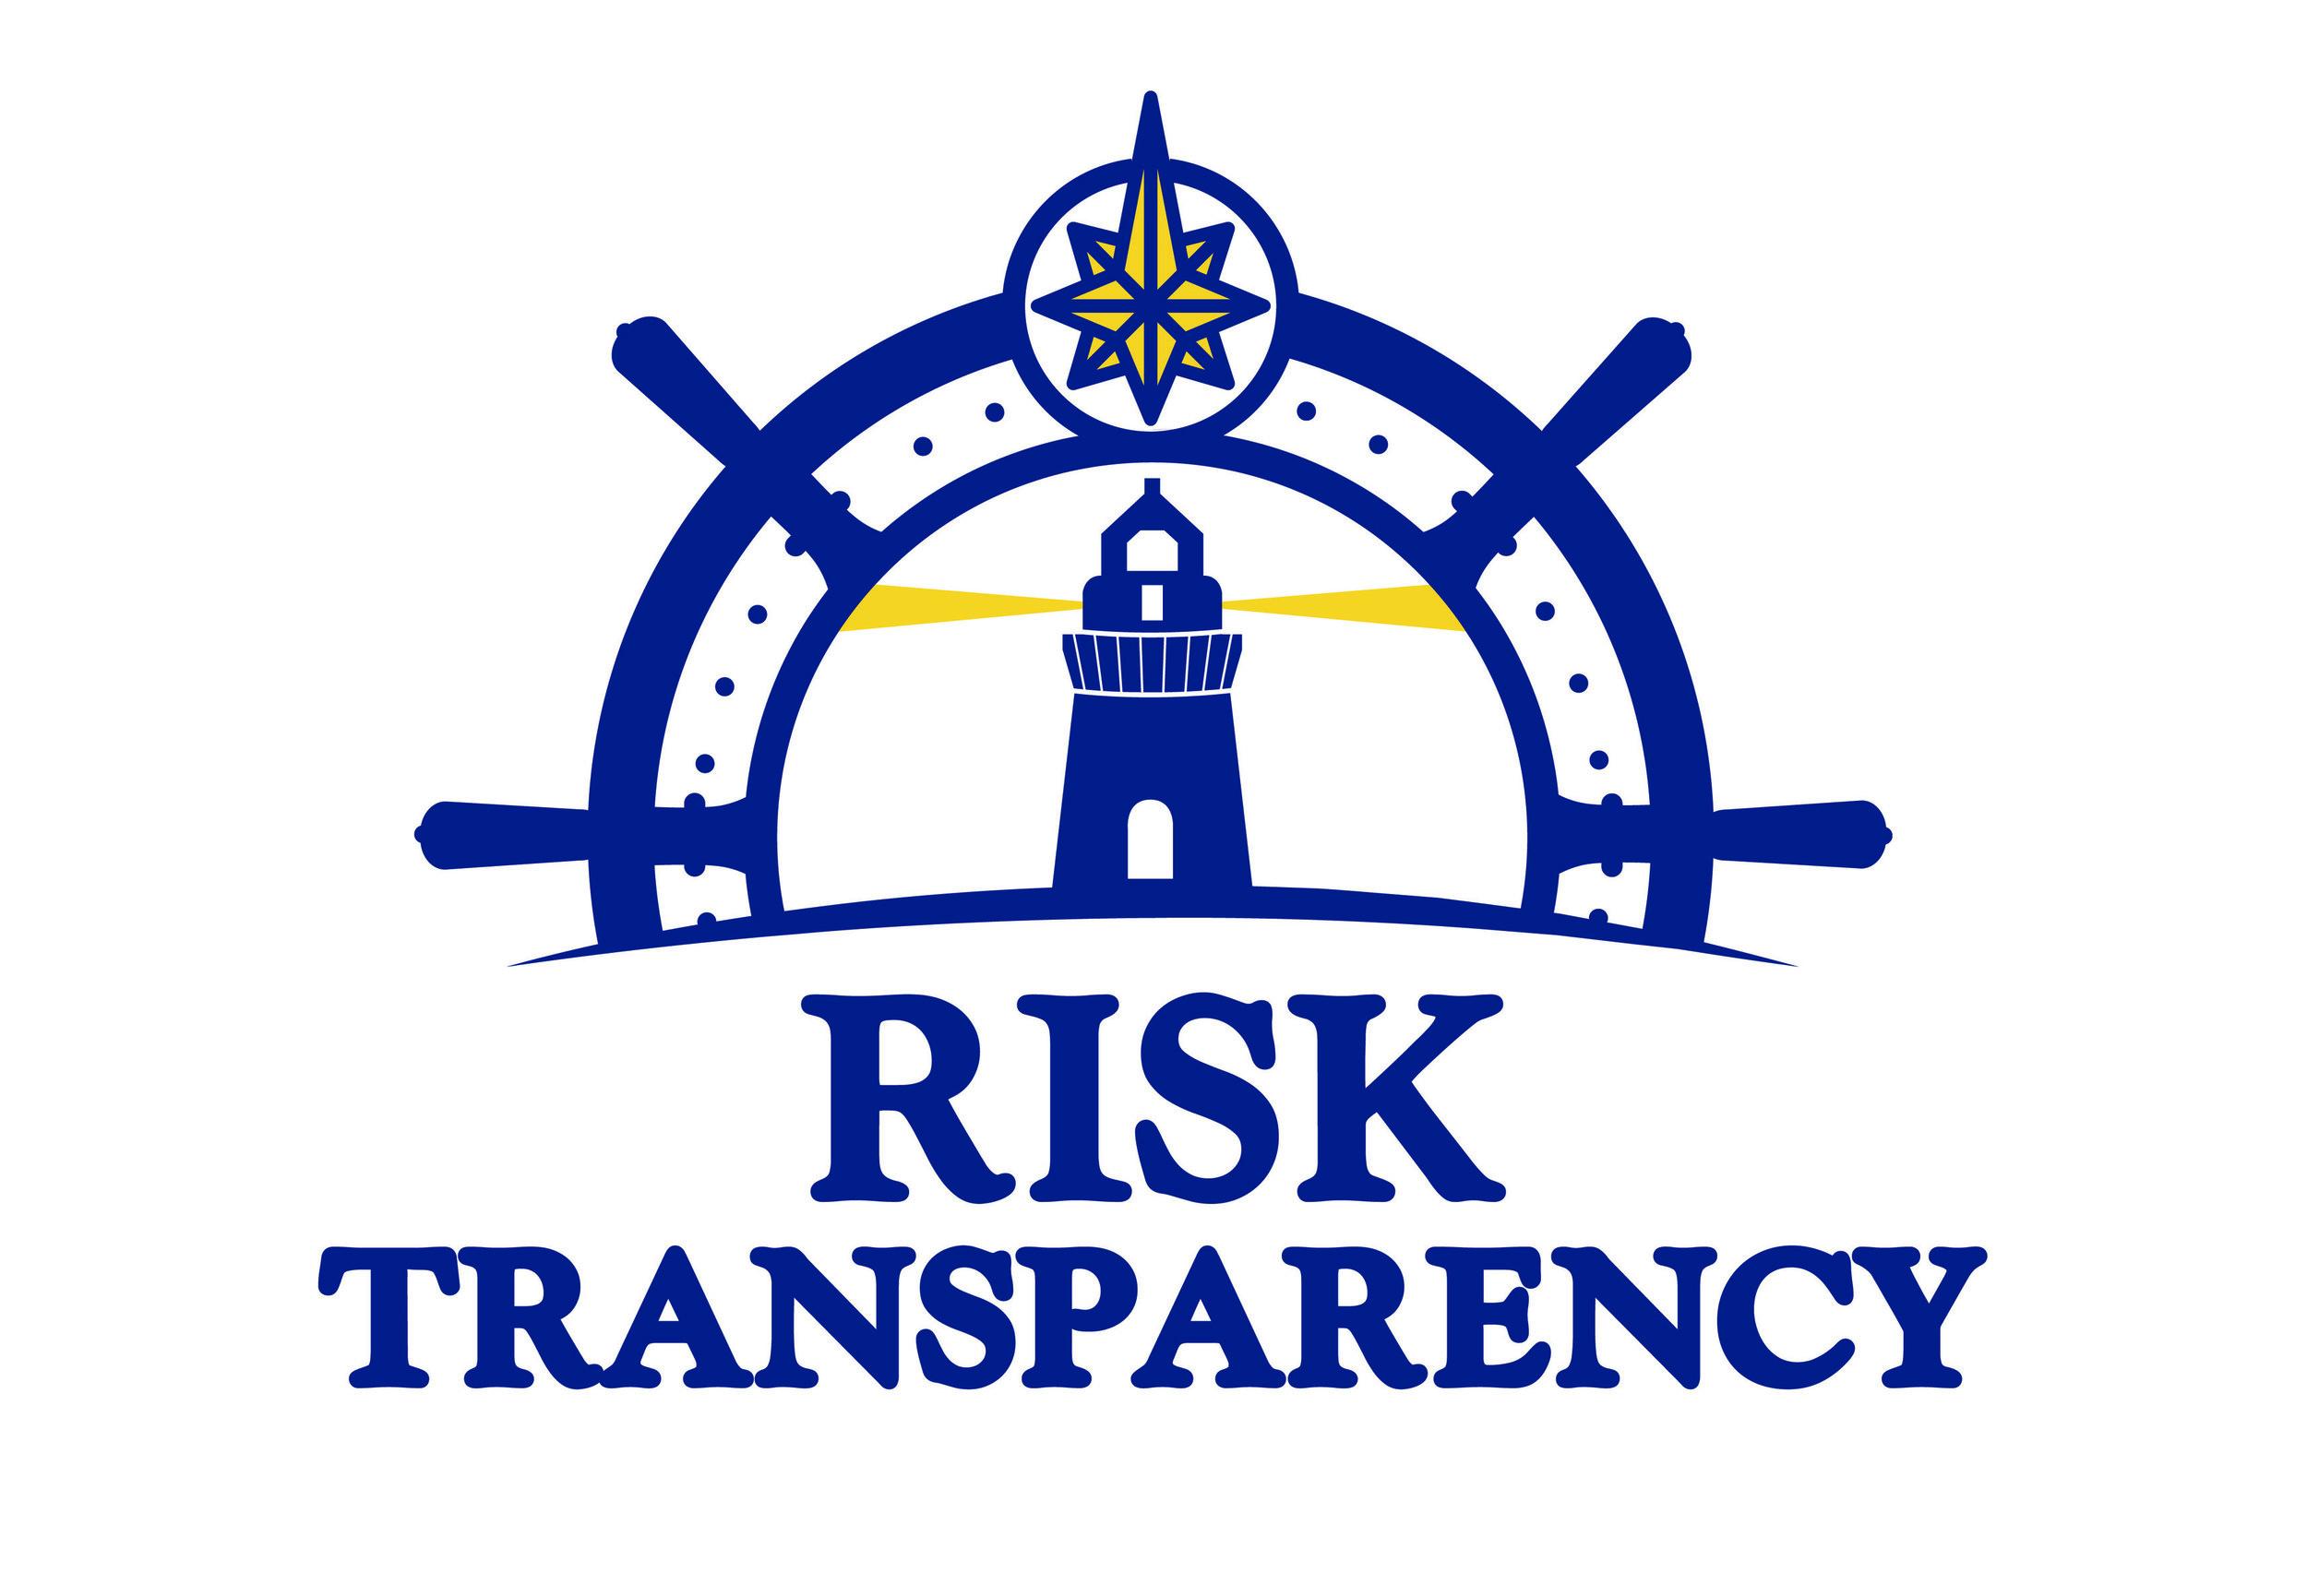 risk+transparency.jpg